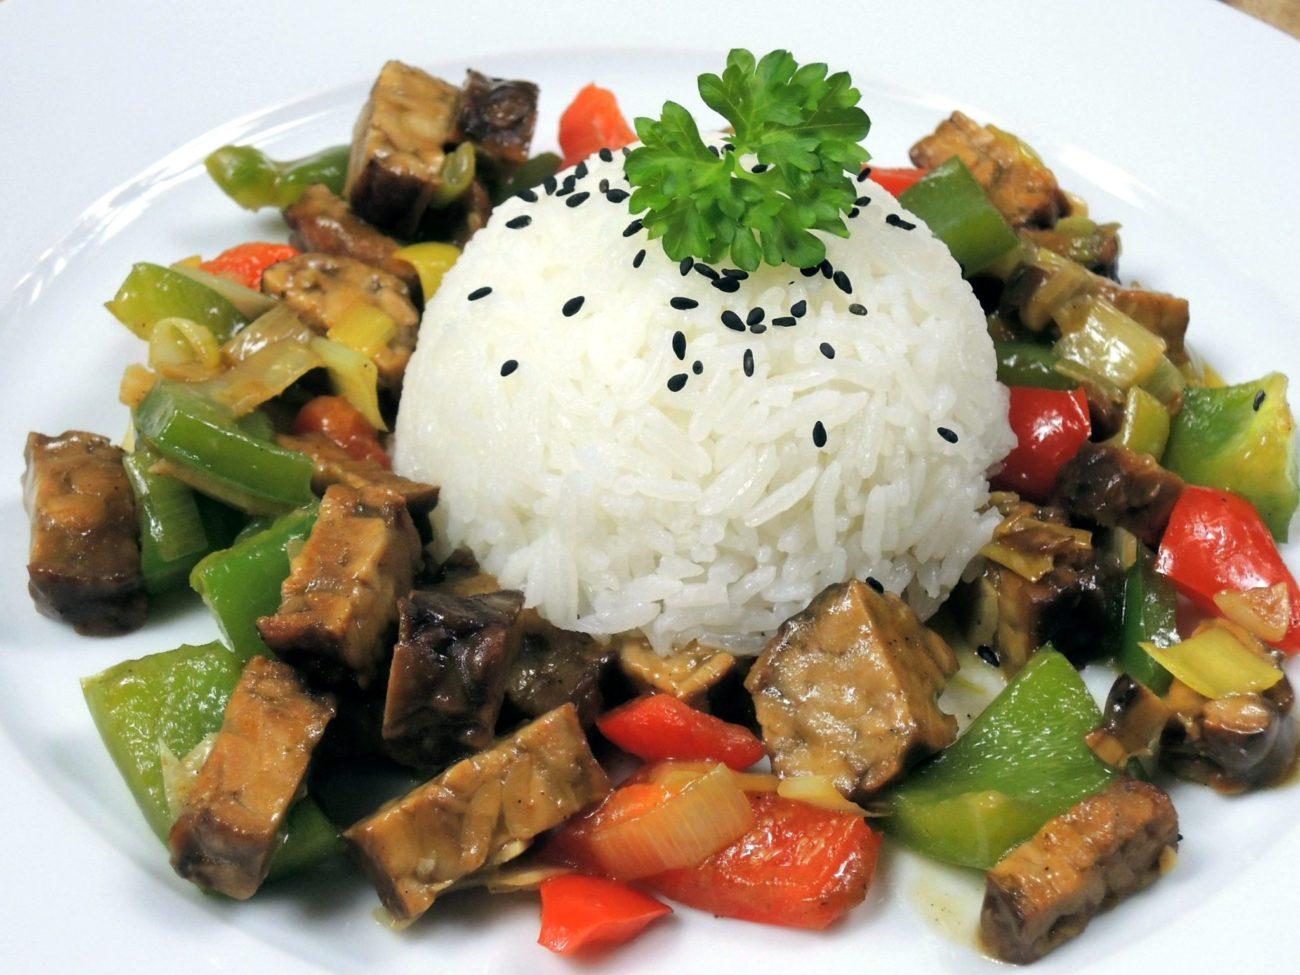 Uzený tempeh s restovanou zeleninou a rýží